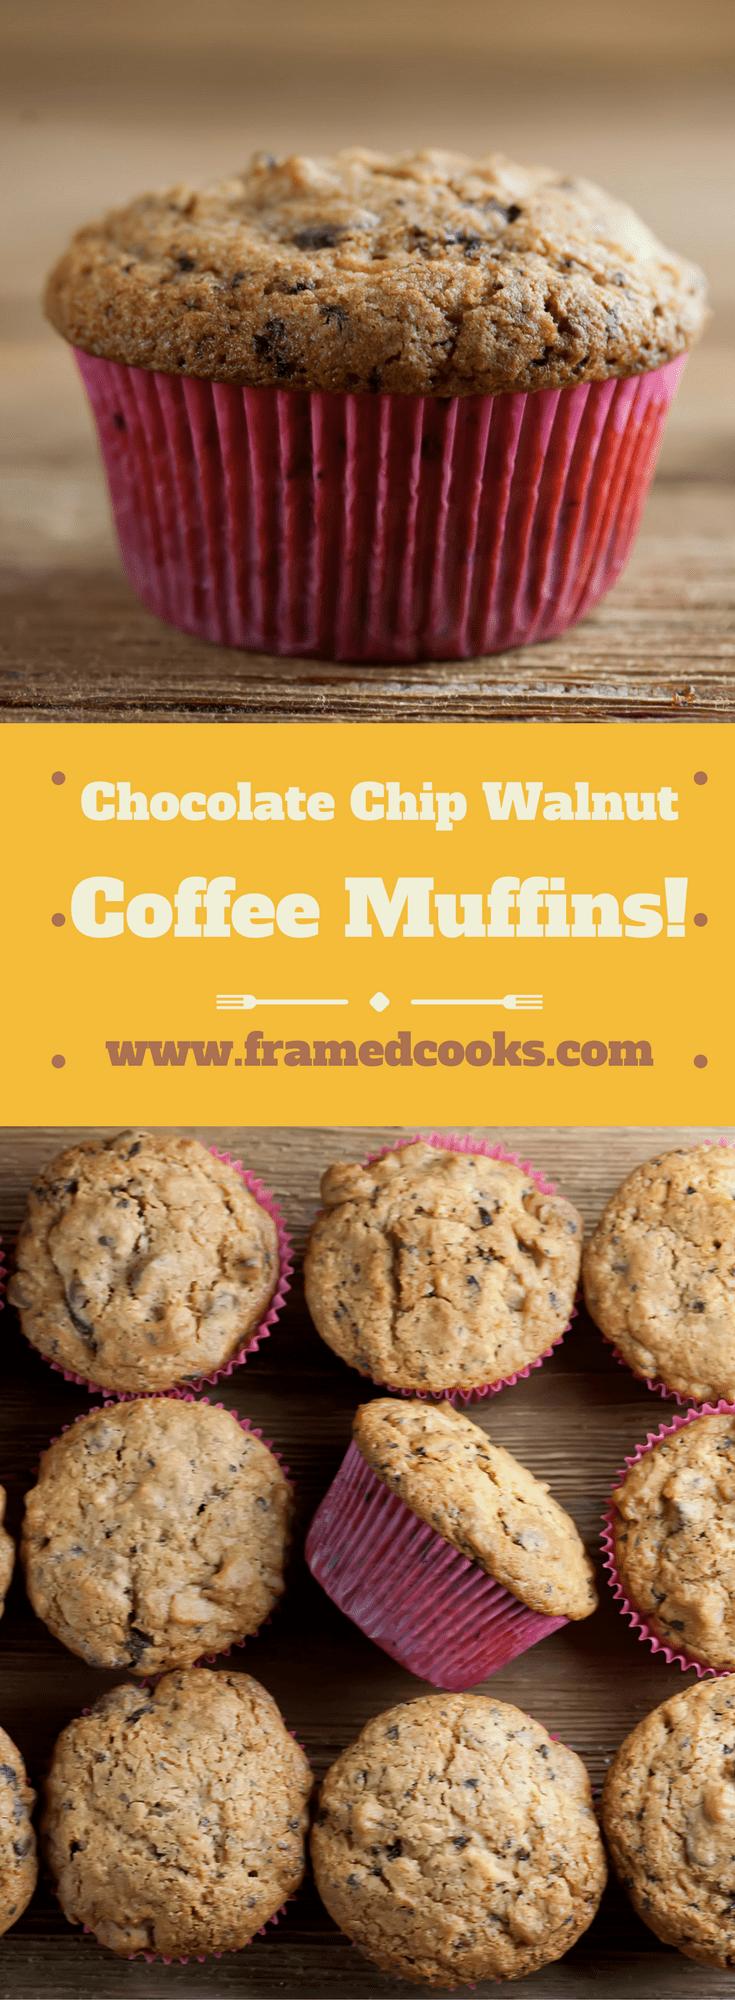 Coffee Walnut Chocolate Chip Muffins - Framed Cooks